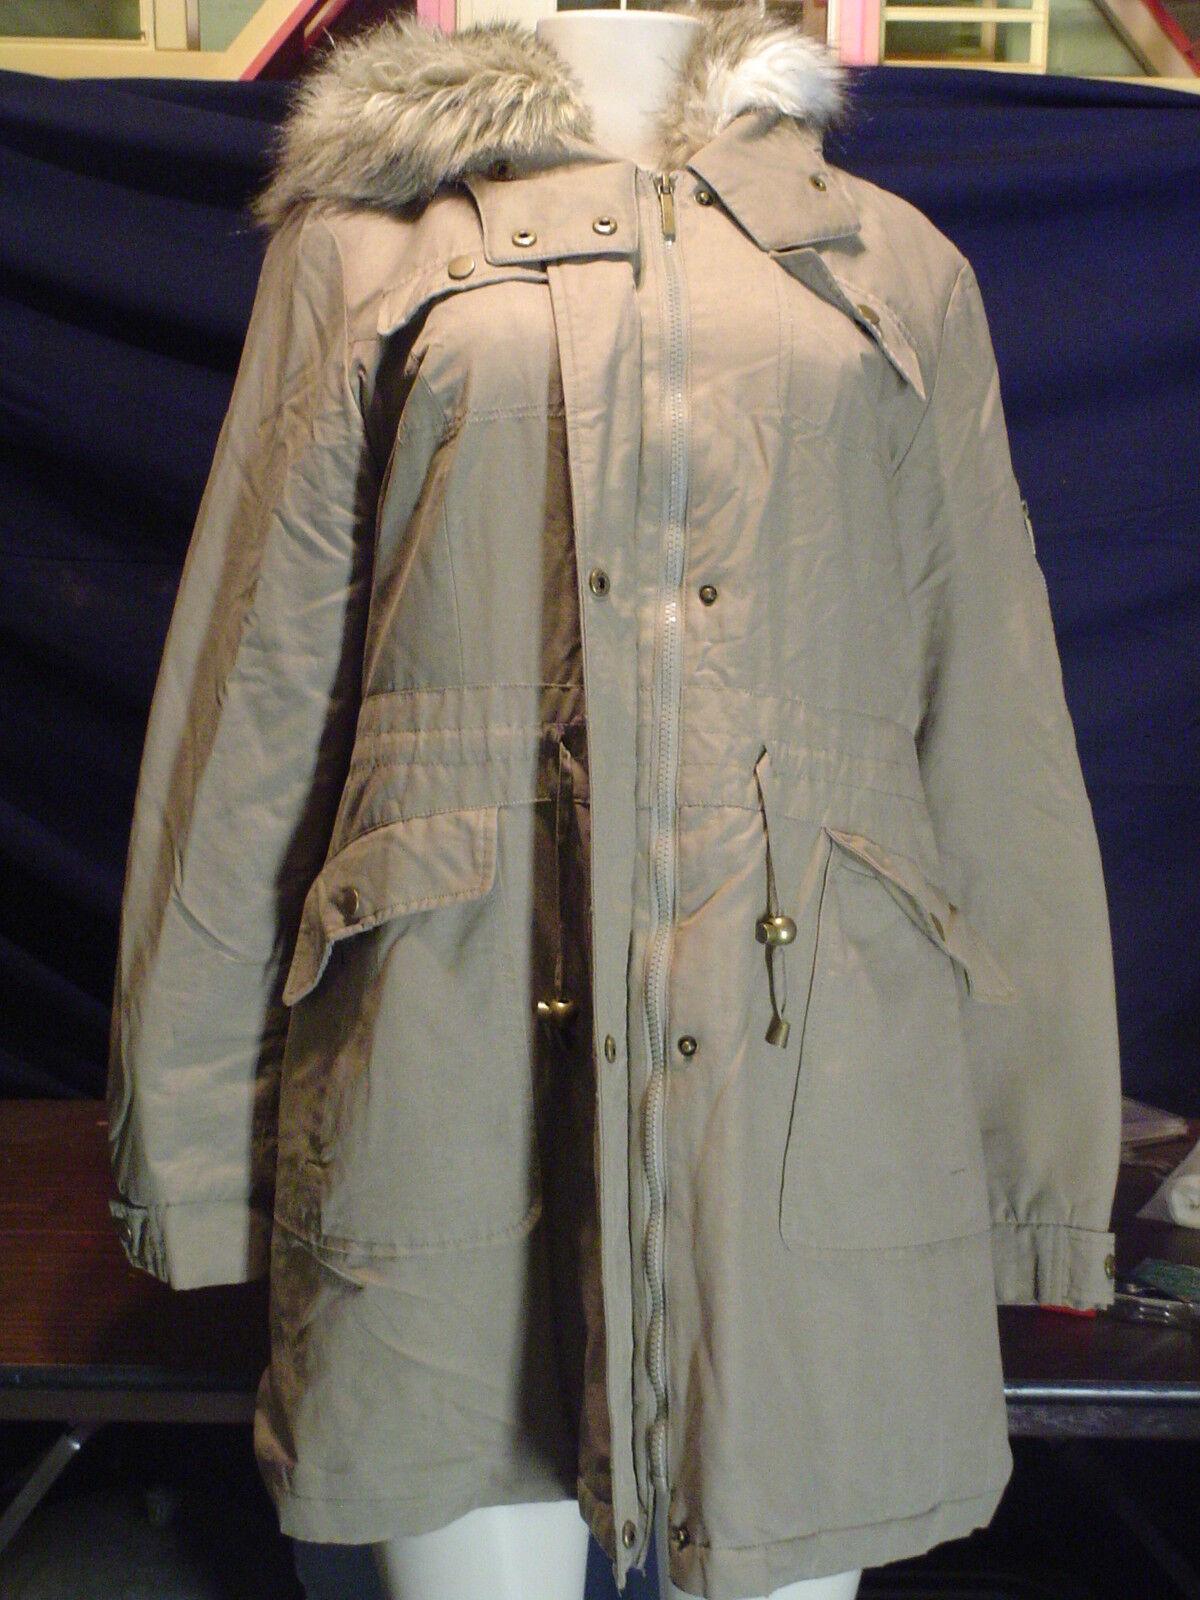 Misses LBD Laundry Size L Tan Faux Fur hooded Lined long Zip Up Coat EUC